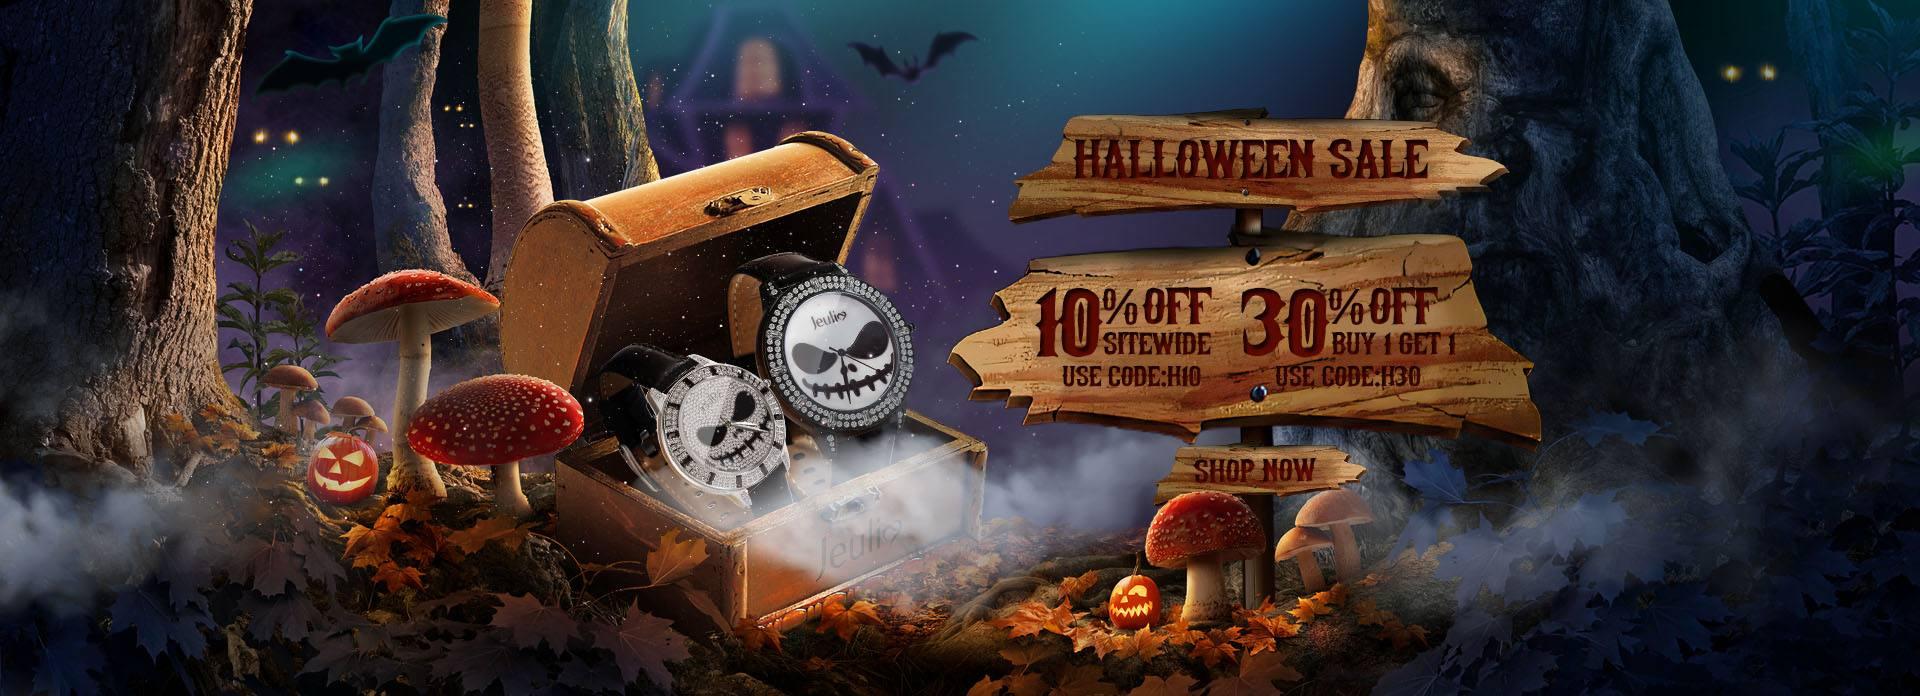 Jeulia Halloween Sale